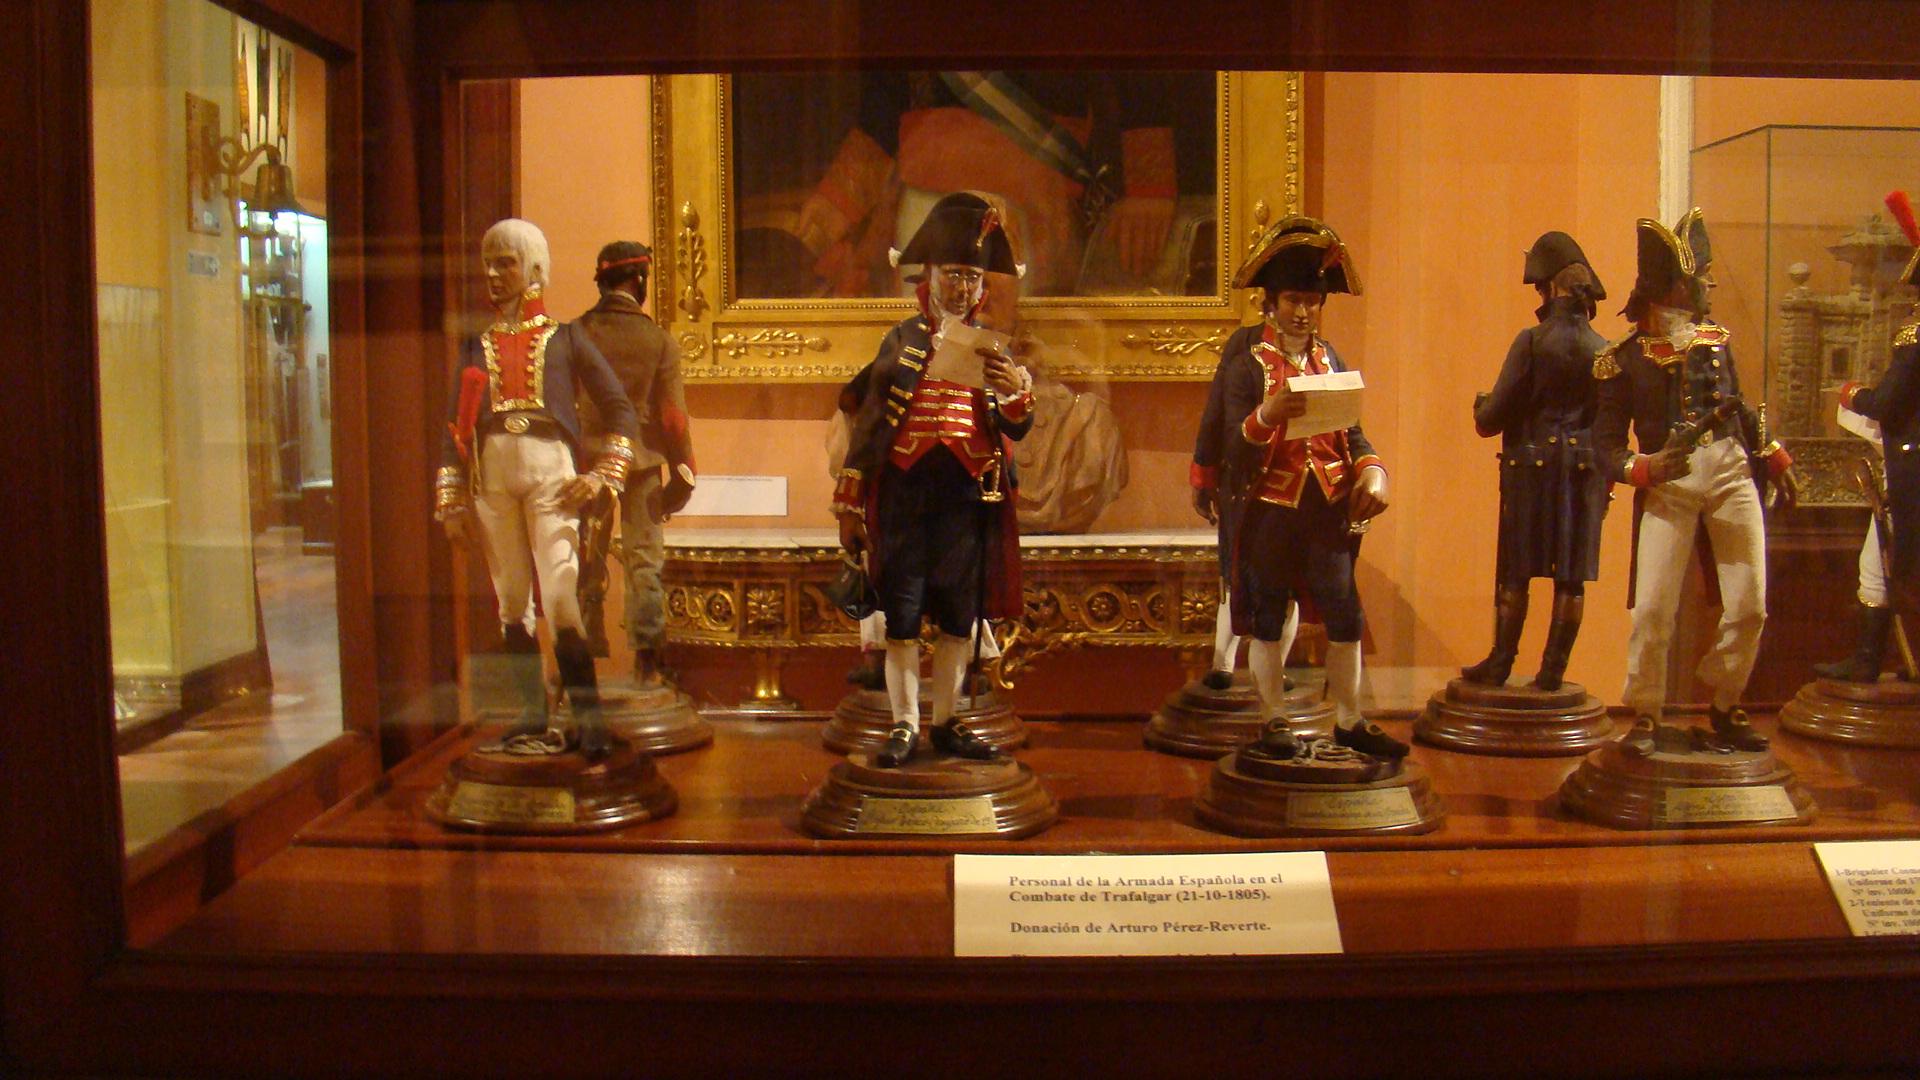 Museo Naval De Madrid.File Museo Naval Madrid Armada Espanola Trafalgar 022 Lou Jpg